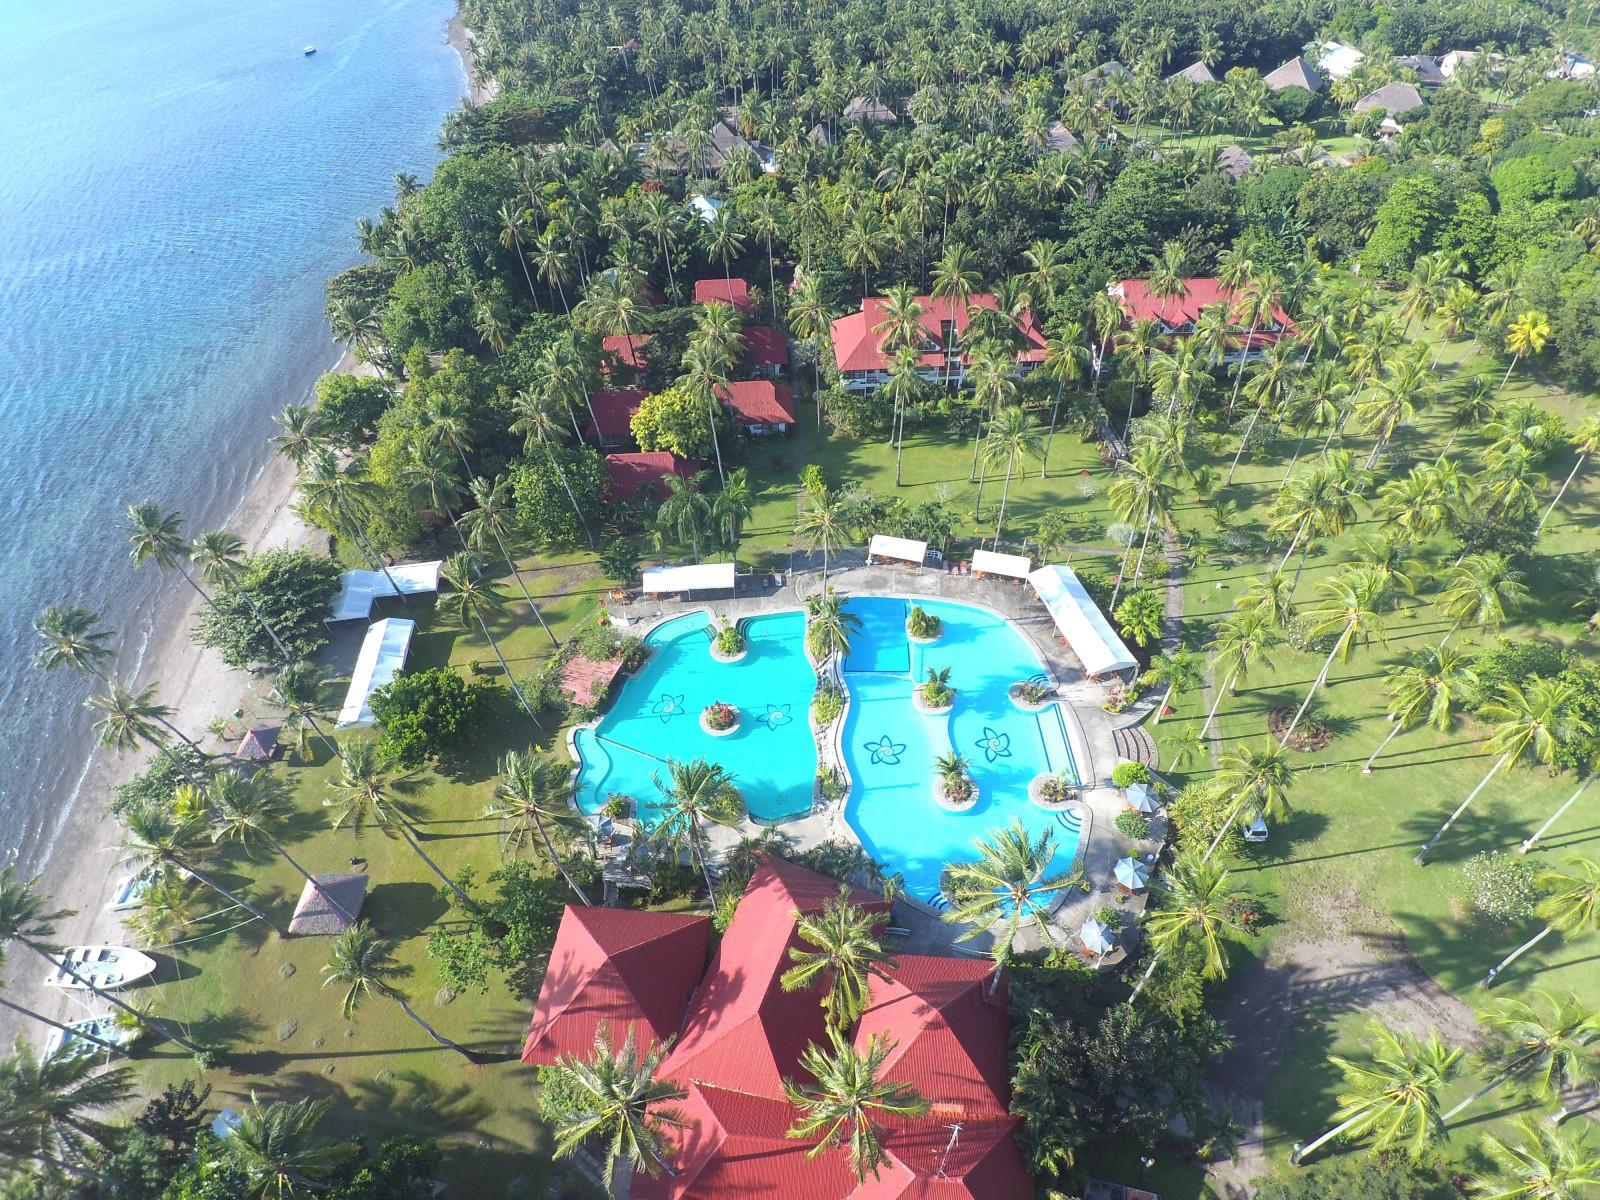 Beach Resort For Sale in Dauin, Negros Oriental